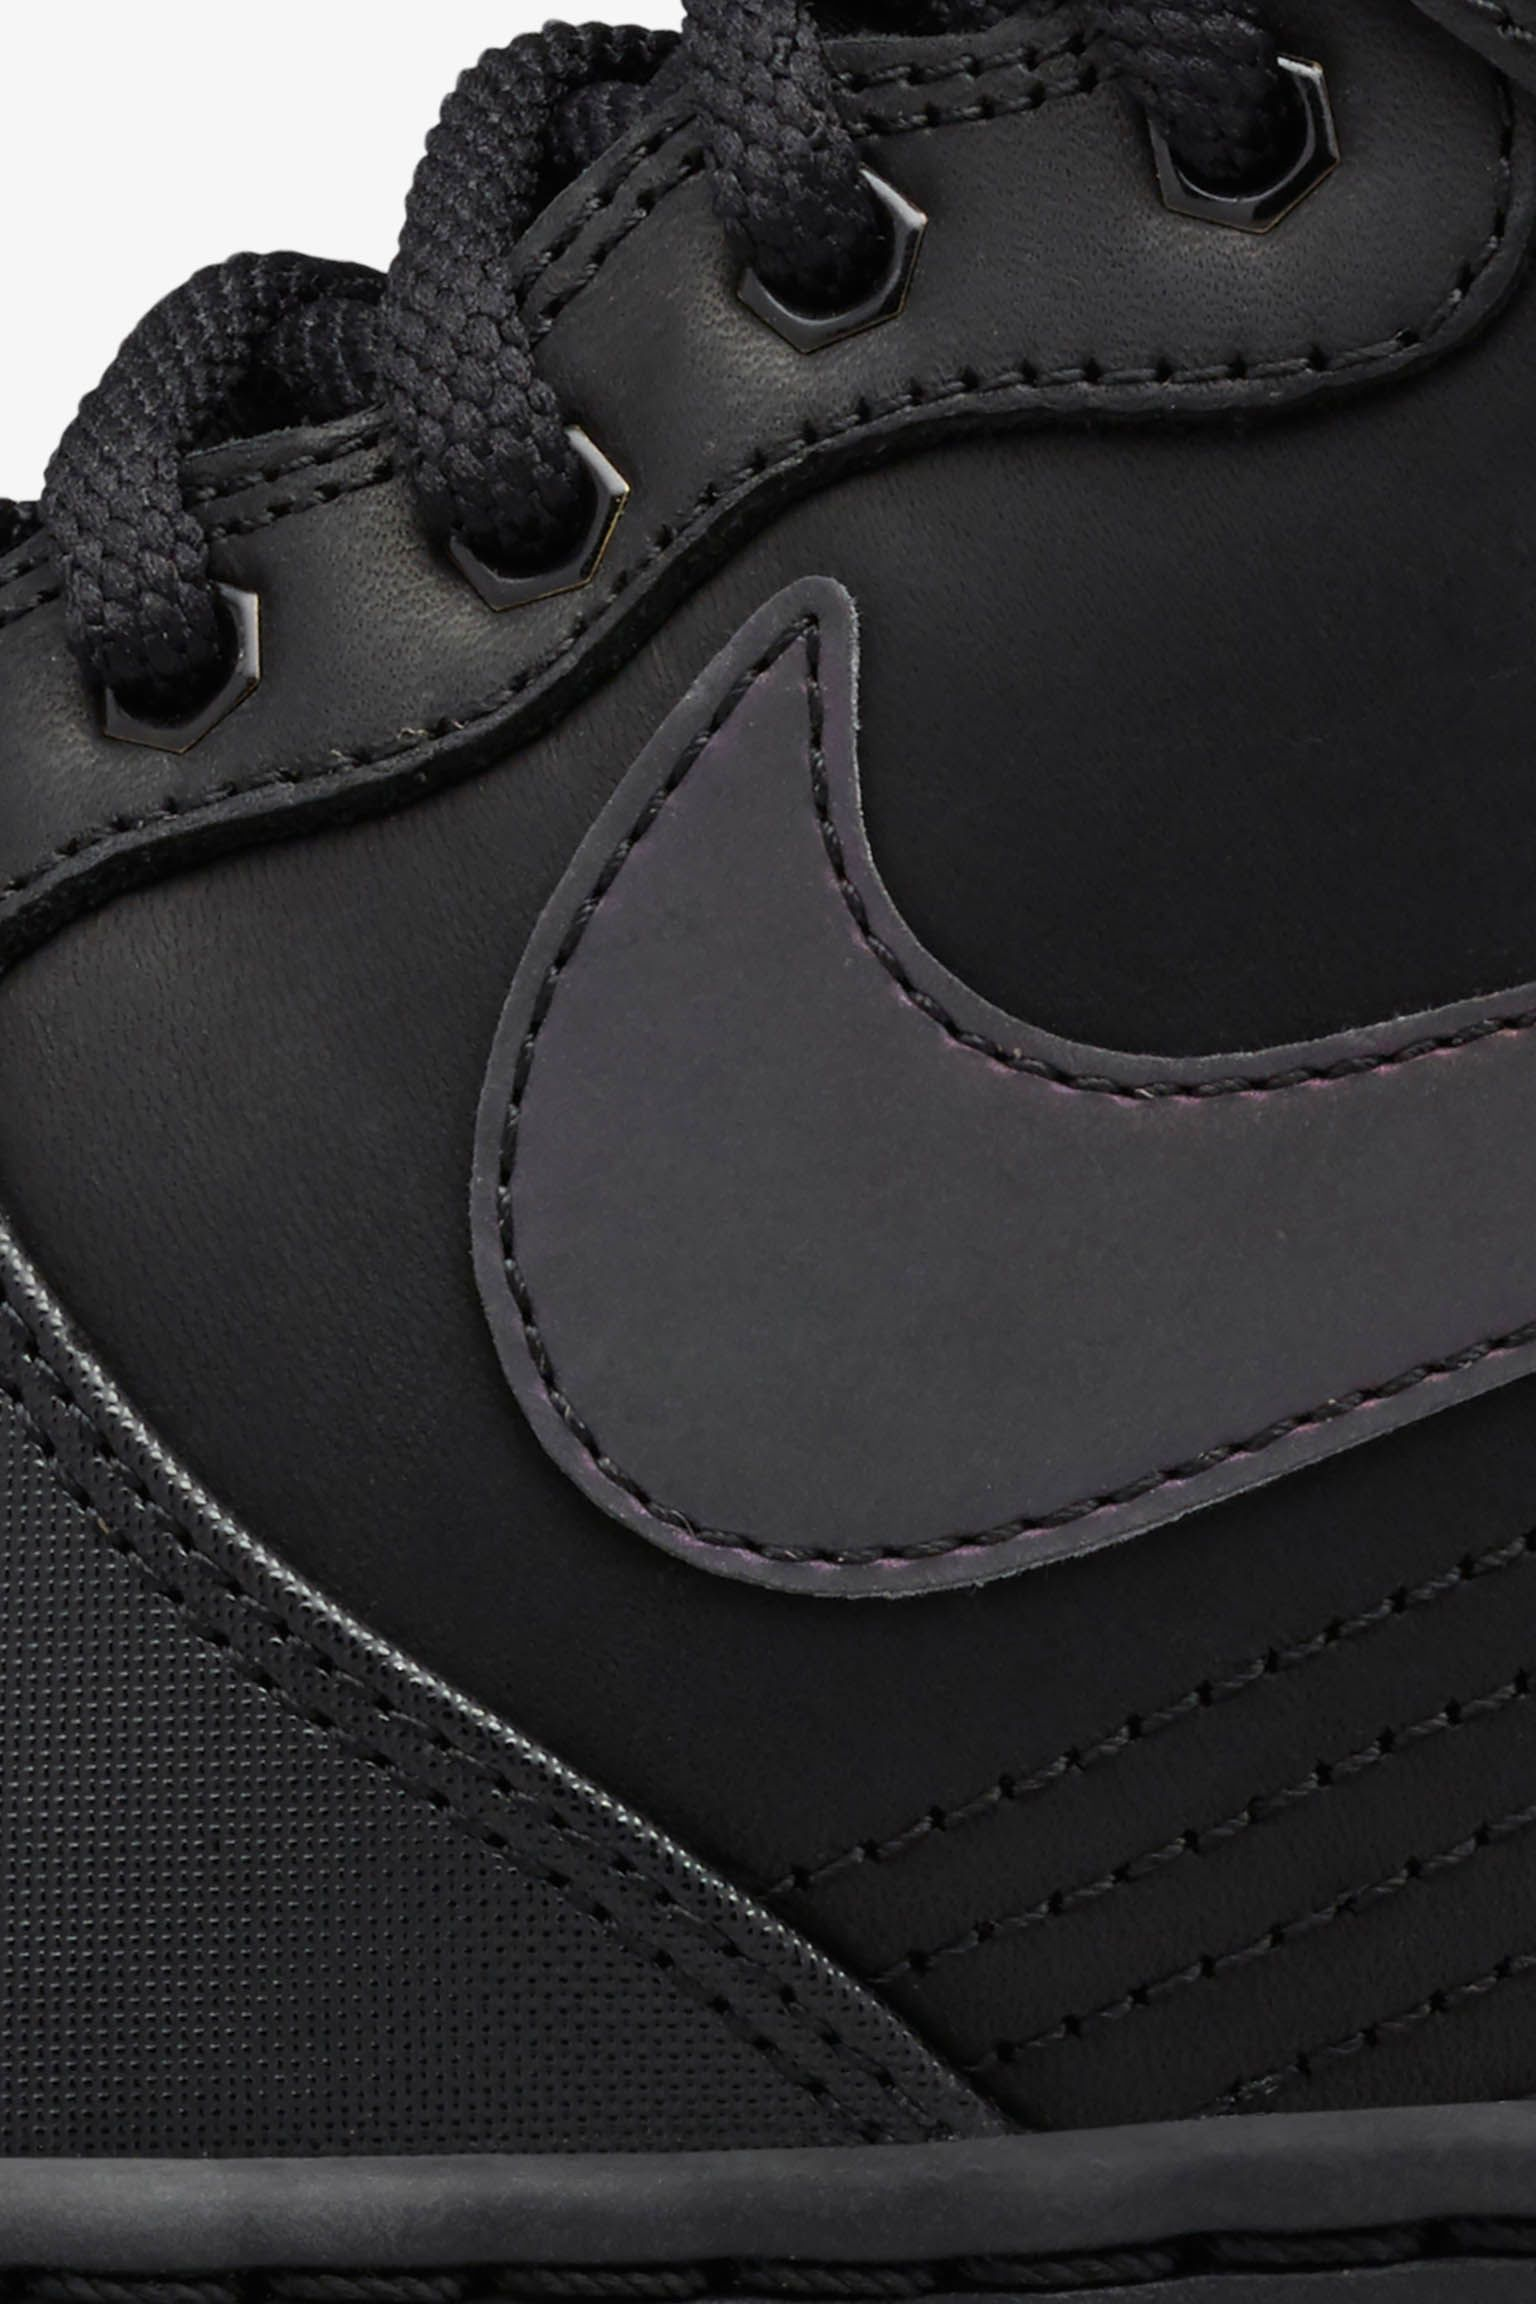 Women's Nike Dunk Sky Hi 2.0 Sneakerboot 'Triple Black'